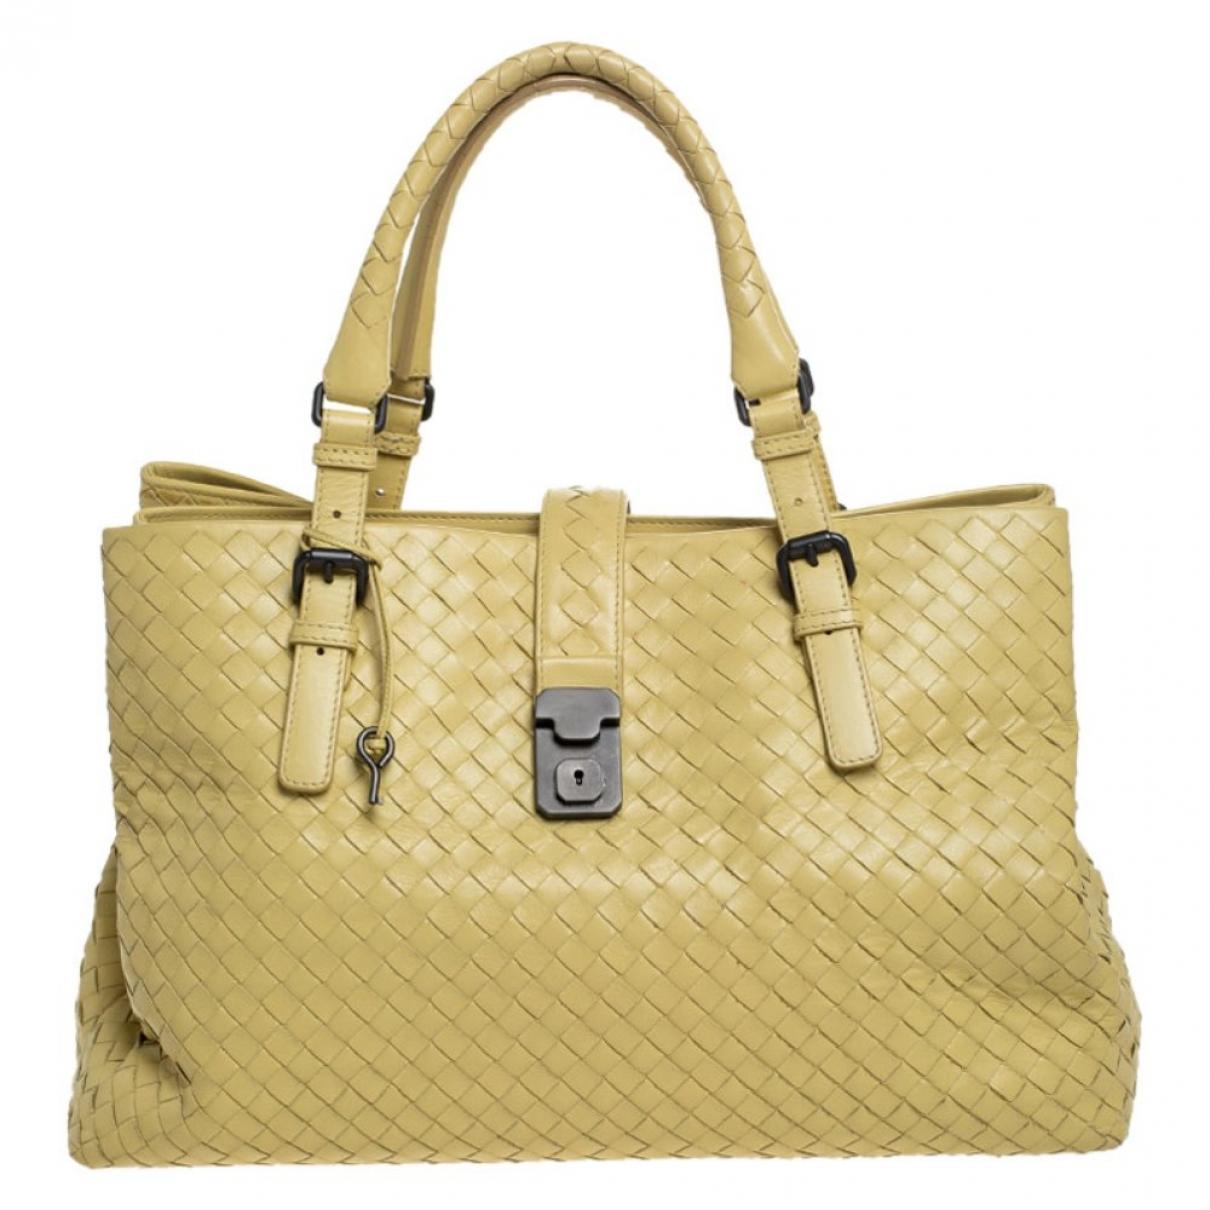 Bottega Veneta - Sac a main Roma pour femme en cuir - jaune